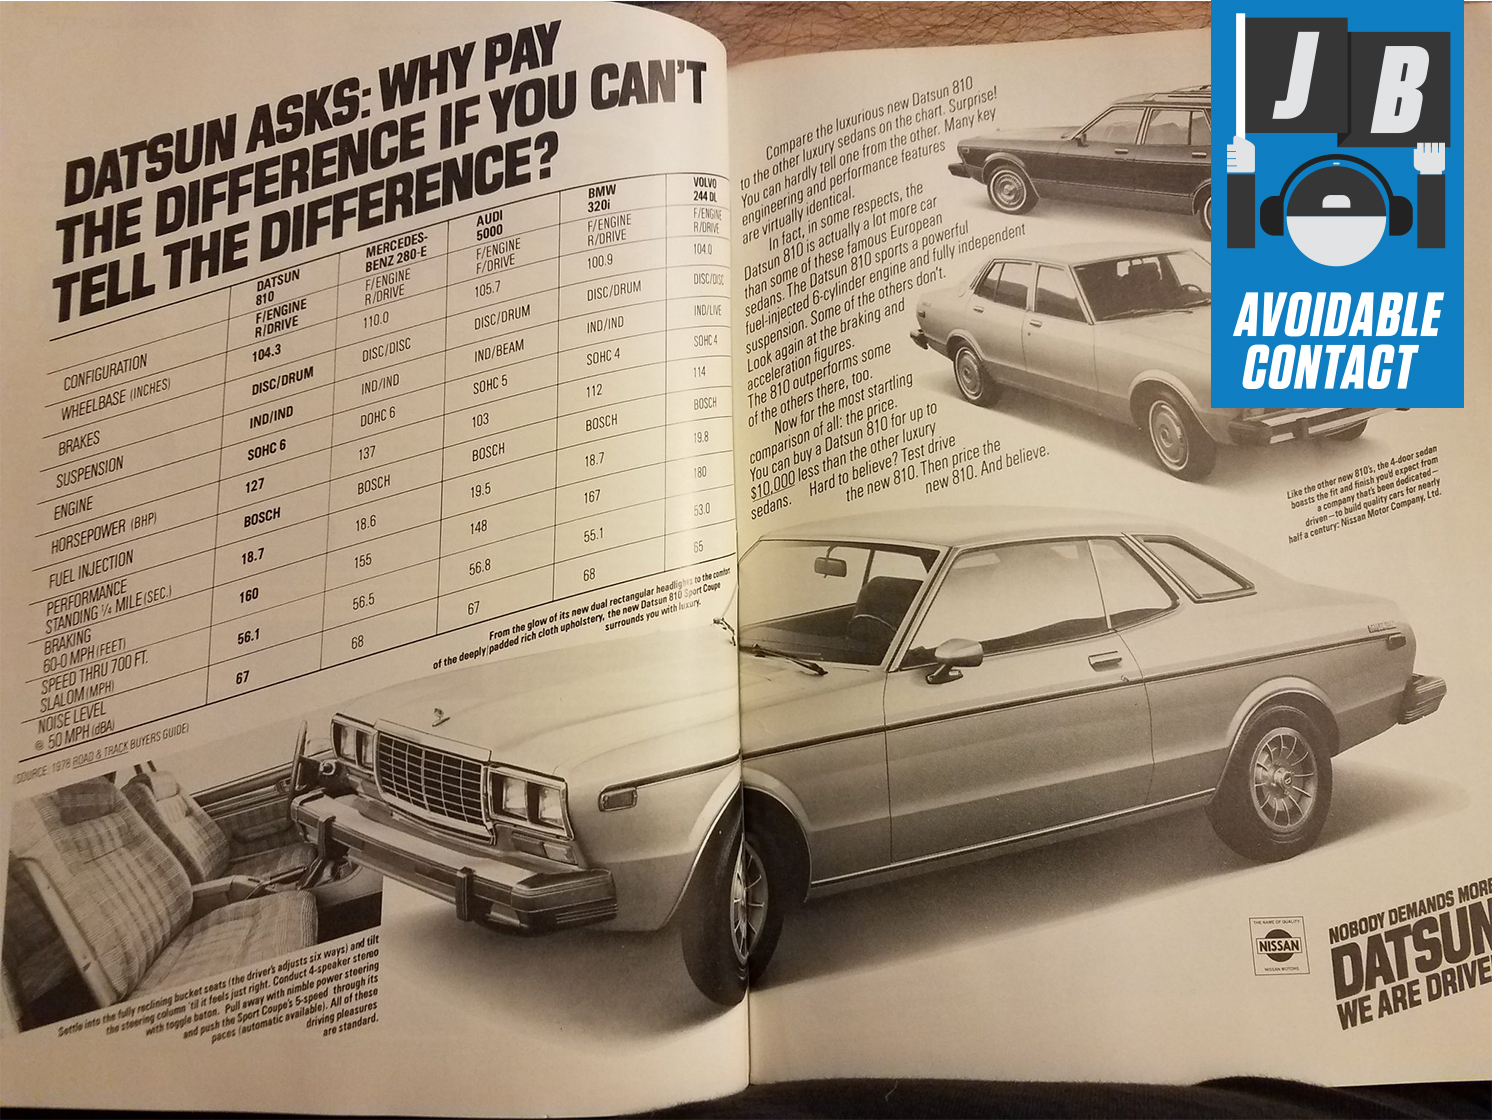 Nissan Datsun Luxury Competitors Comparison Advert